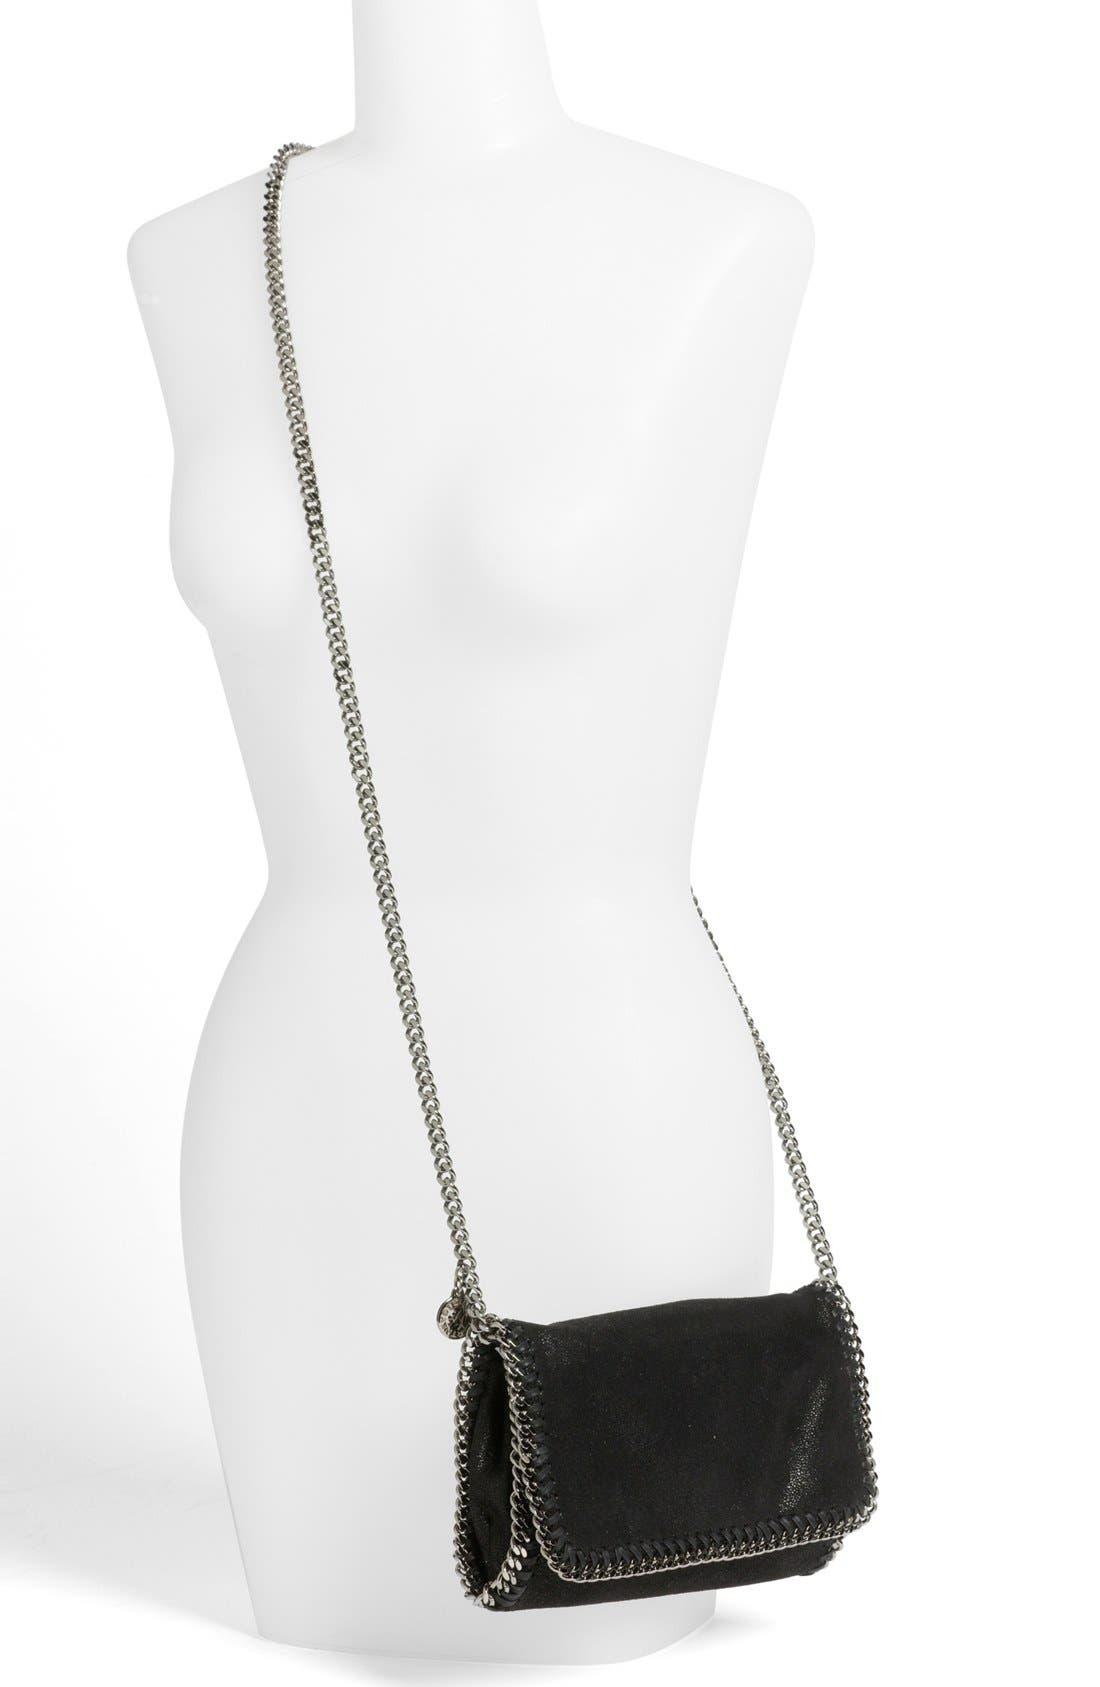 'Falabella - Shaggy Deer' Faux Leather Crossbody Bag,                             Alternate thumbnail 7, color,                             BLACK SLVR HRDWR